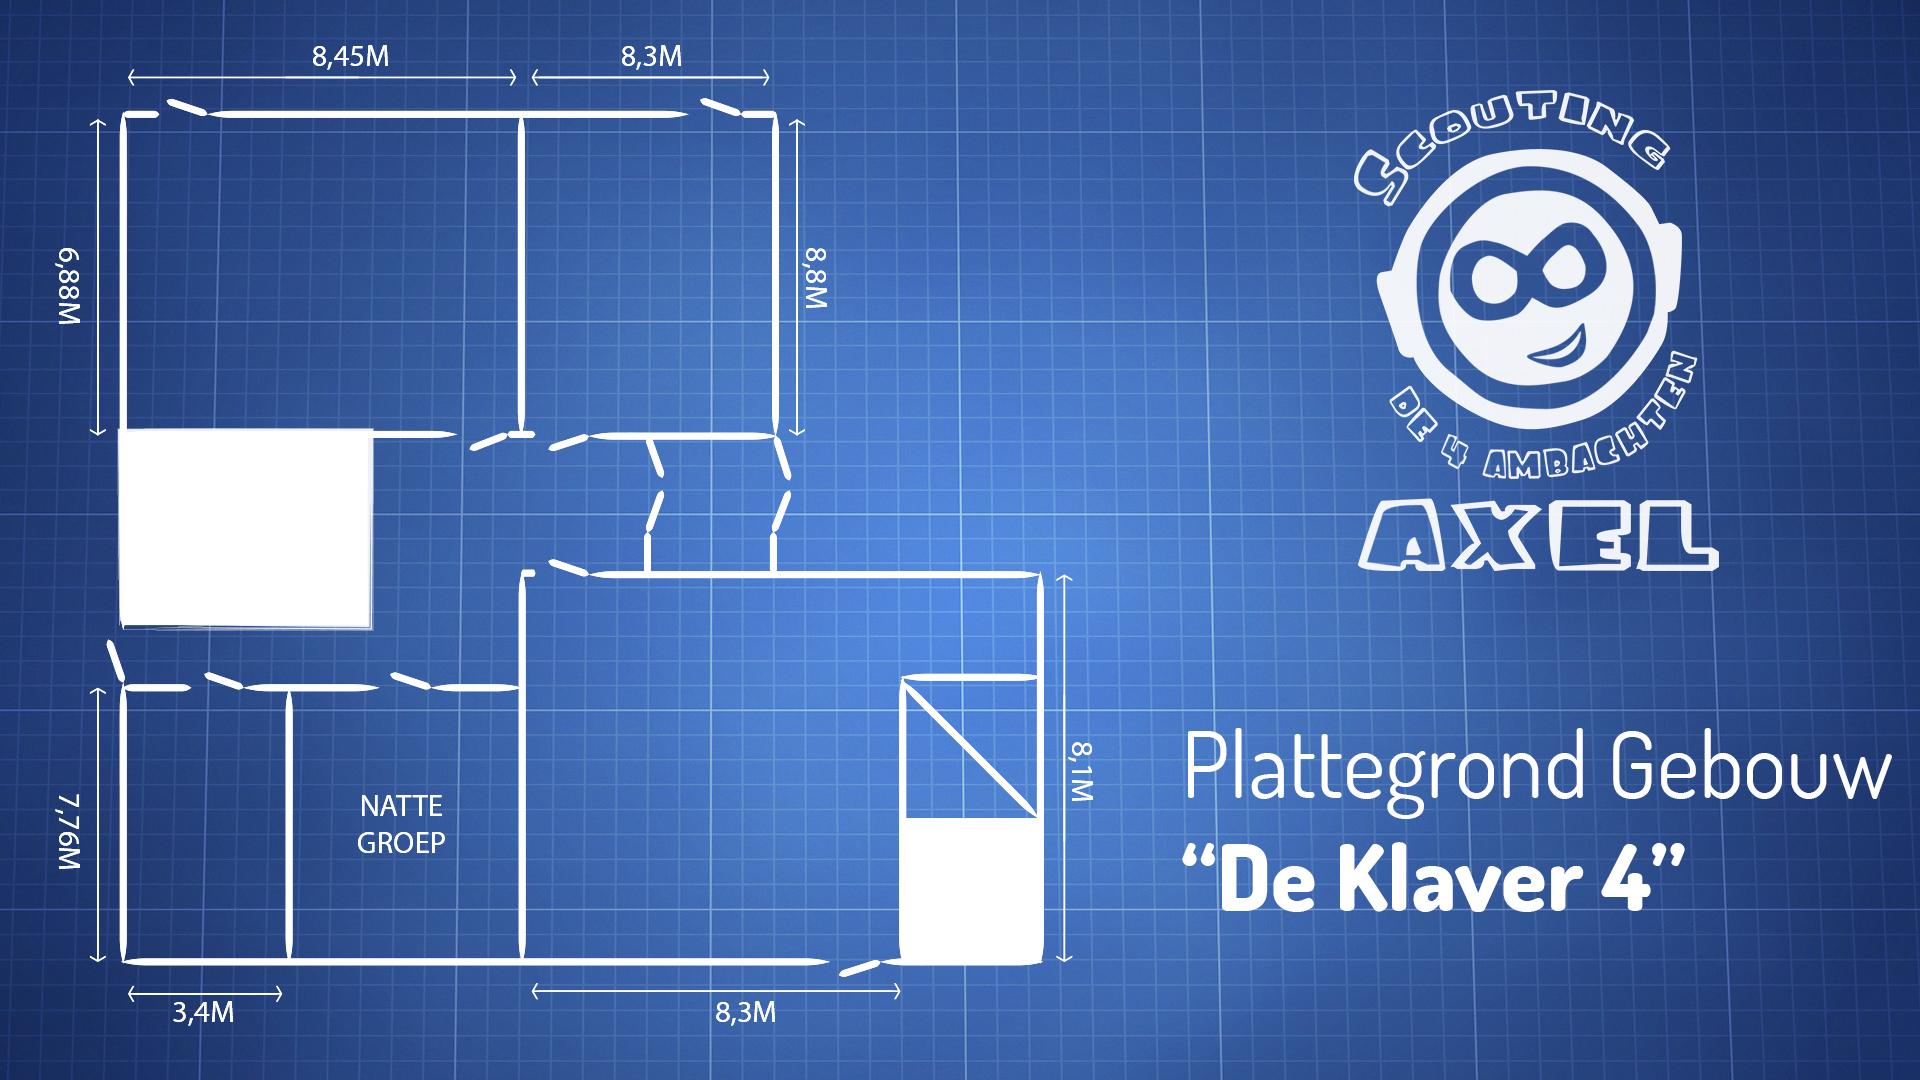 plattegrond_scouting_axel_de_klaver_4